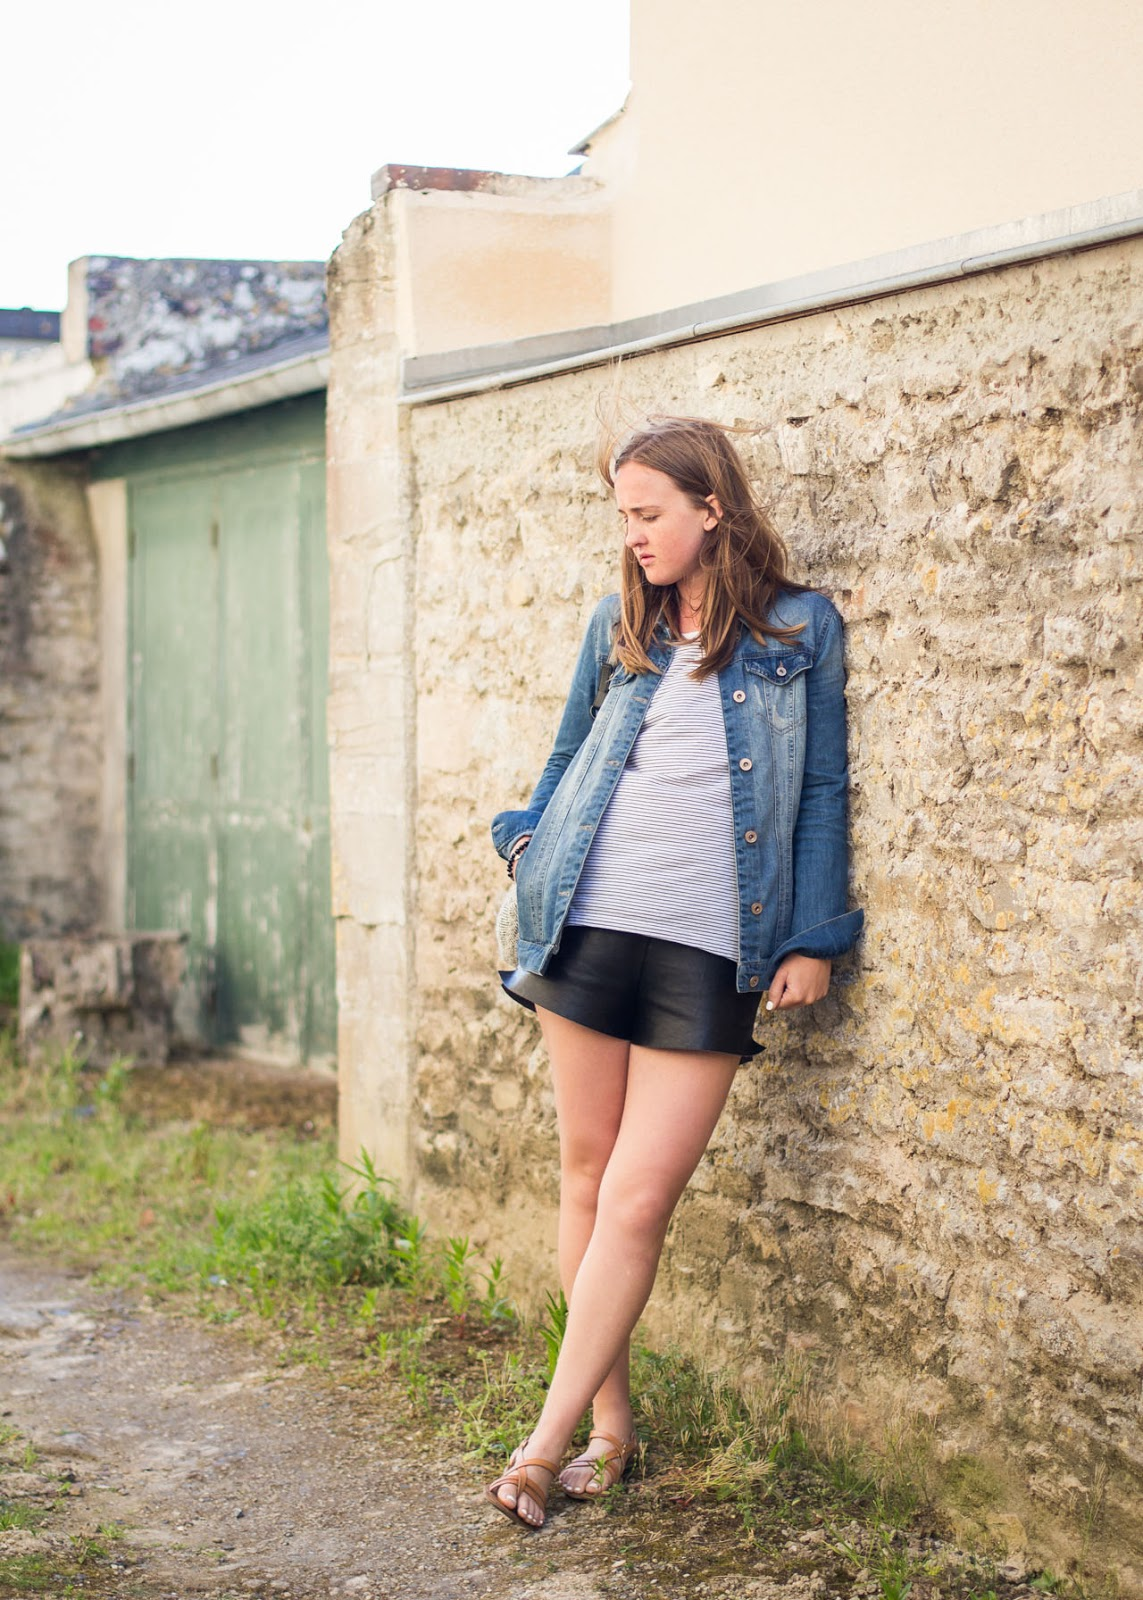 new - Only - denim jacket - zara - t-shirt - Vacation Style - France